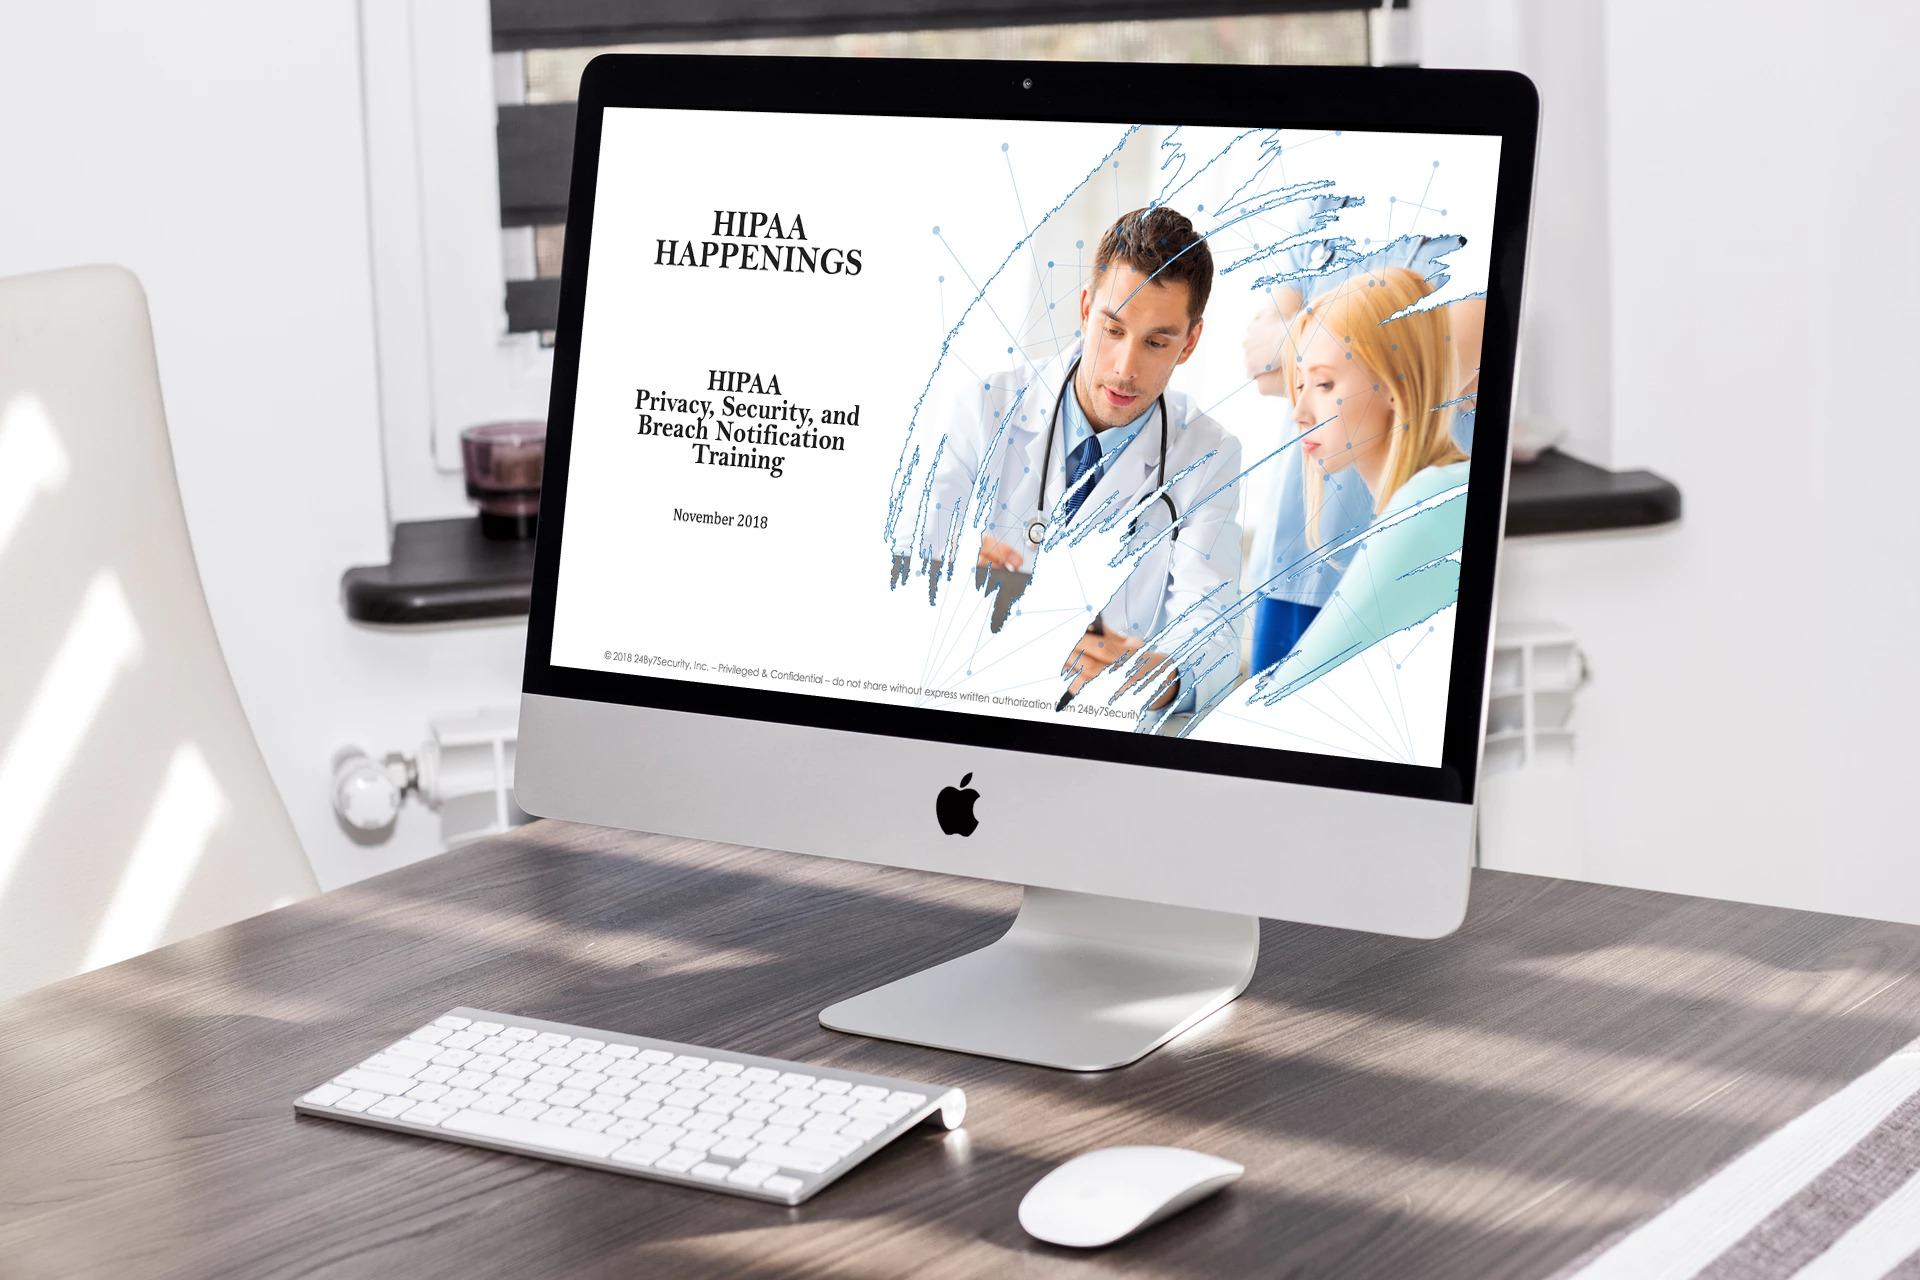 HIPAA Happenings HIPAA Privacy and Security Training webinar